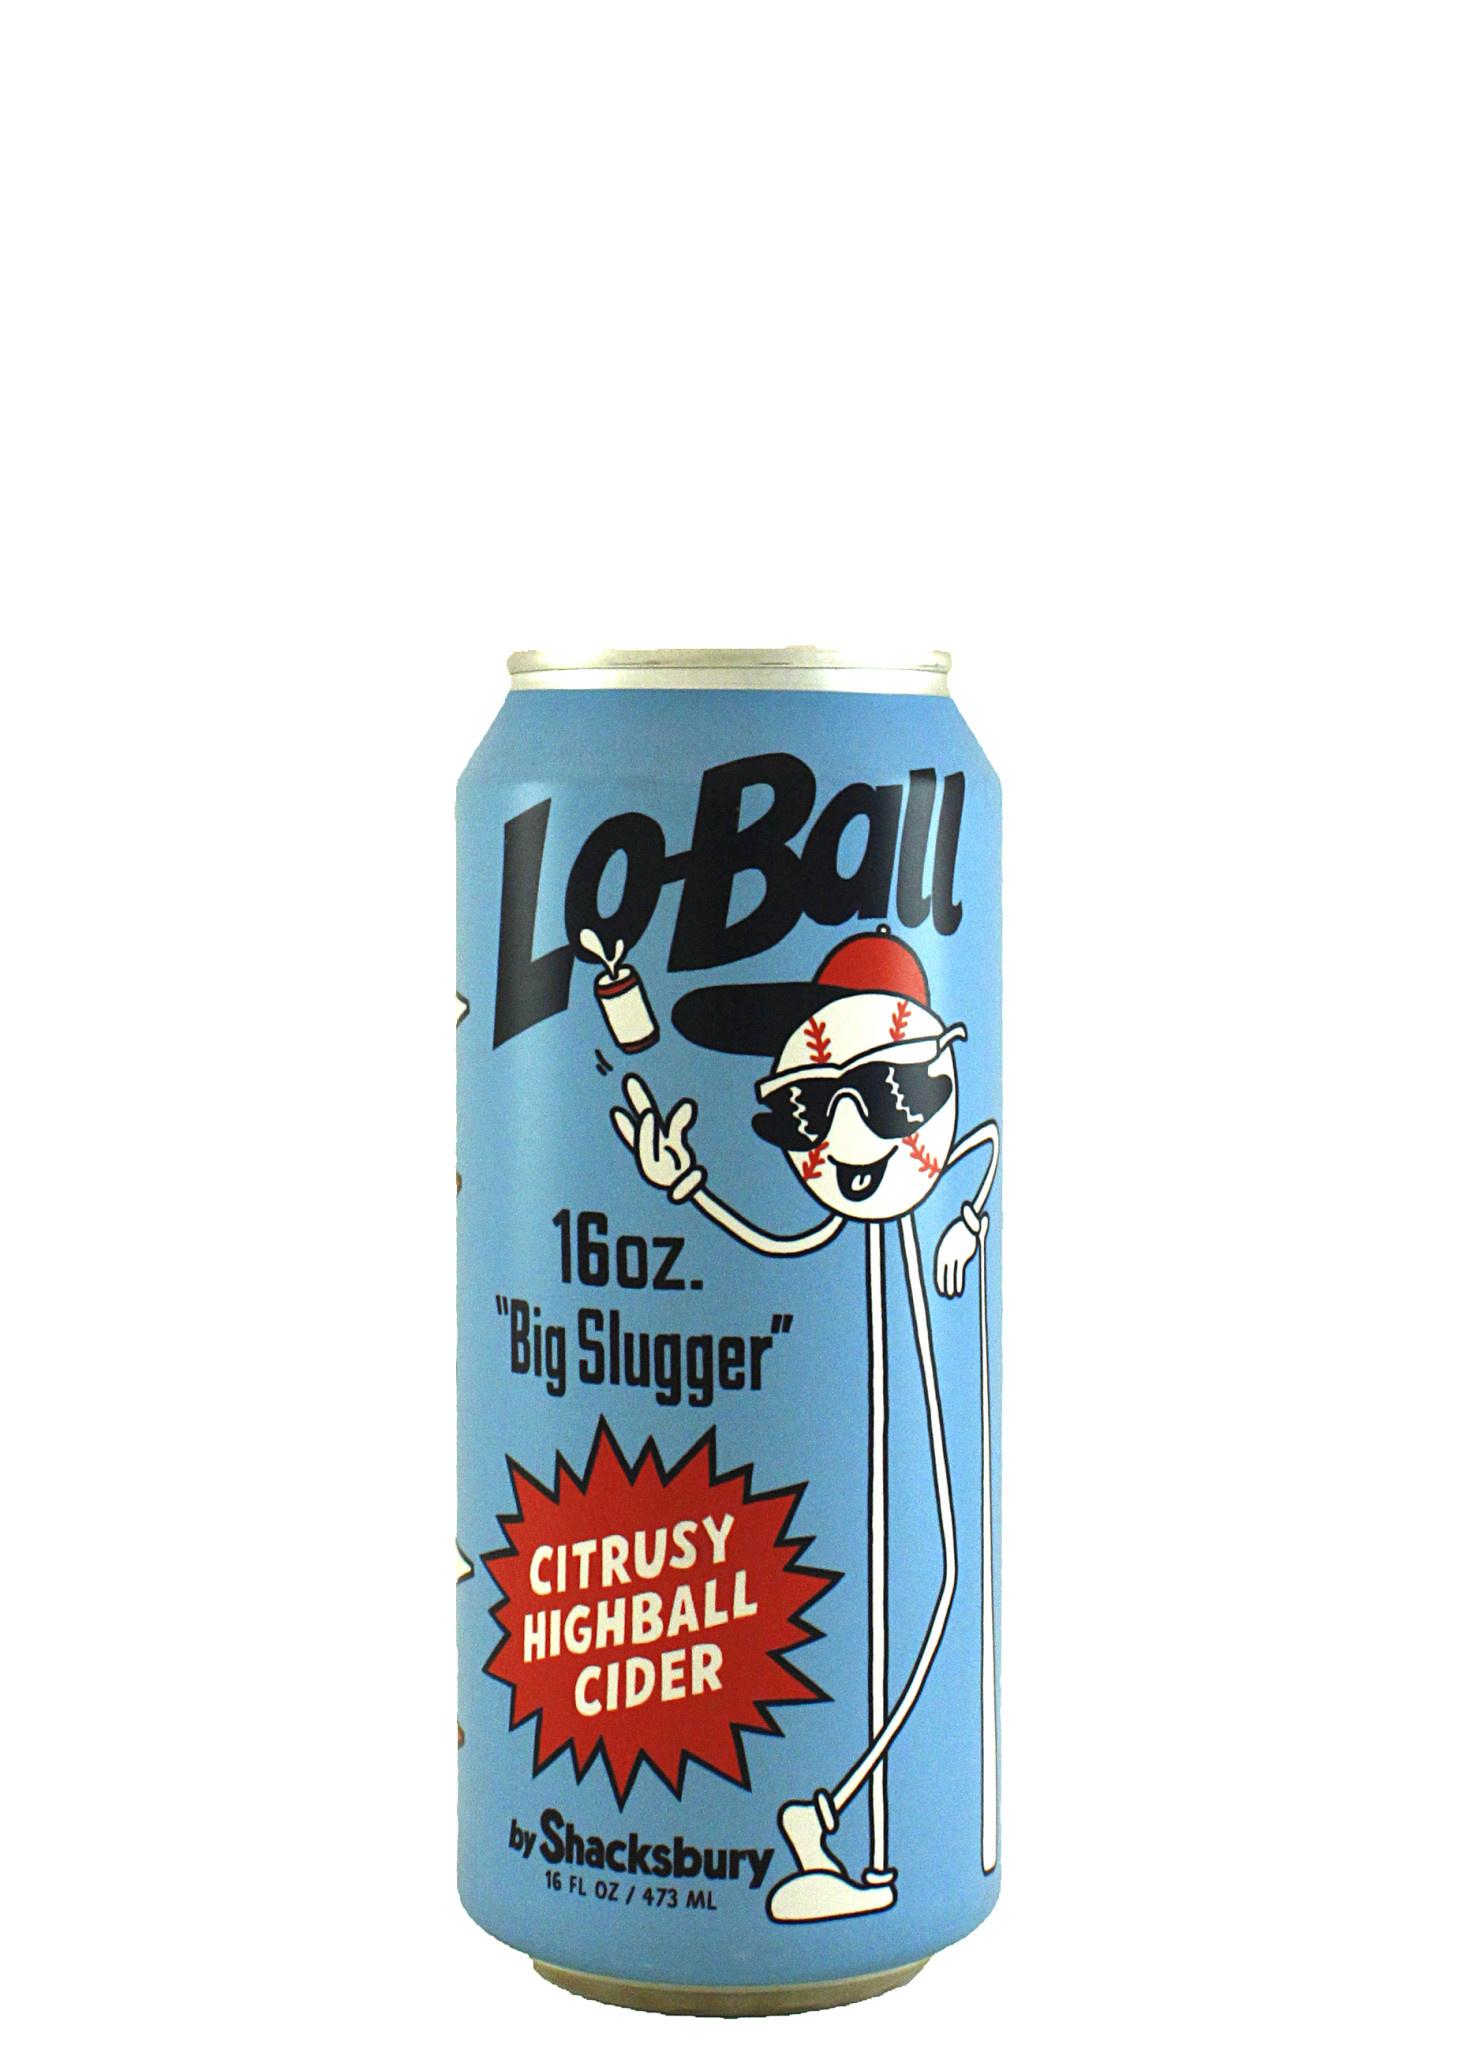 "Shacksbury Cider Lo-Ball ""Big Slugger"" Citrusy Highball Cider 16oz. Can - Vermont"